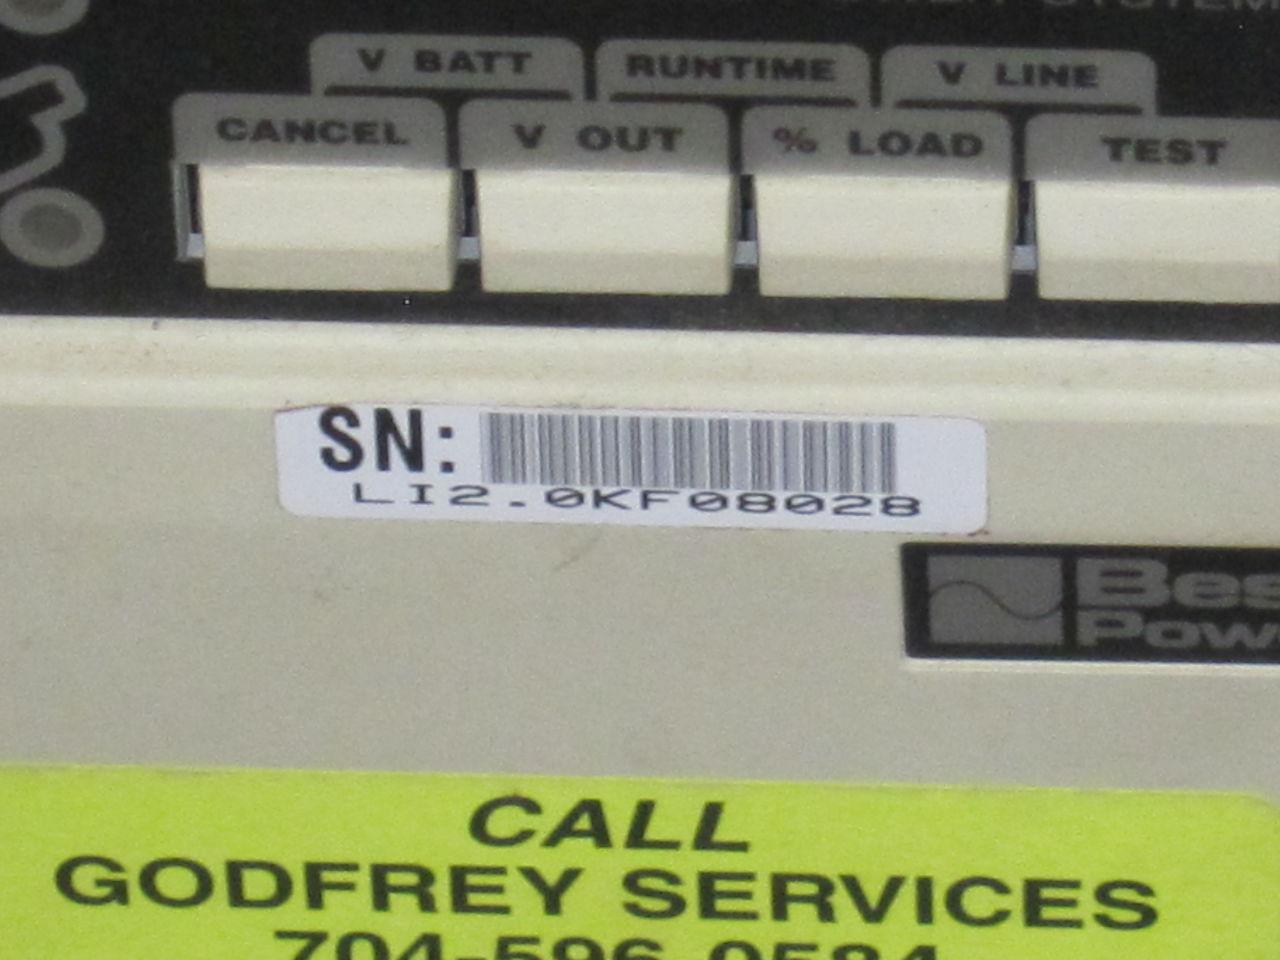 FORTRESS LIZ.OKVAF Uninterruptible Power Supply / UPS